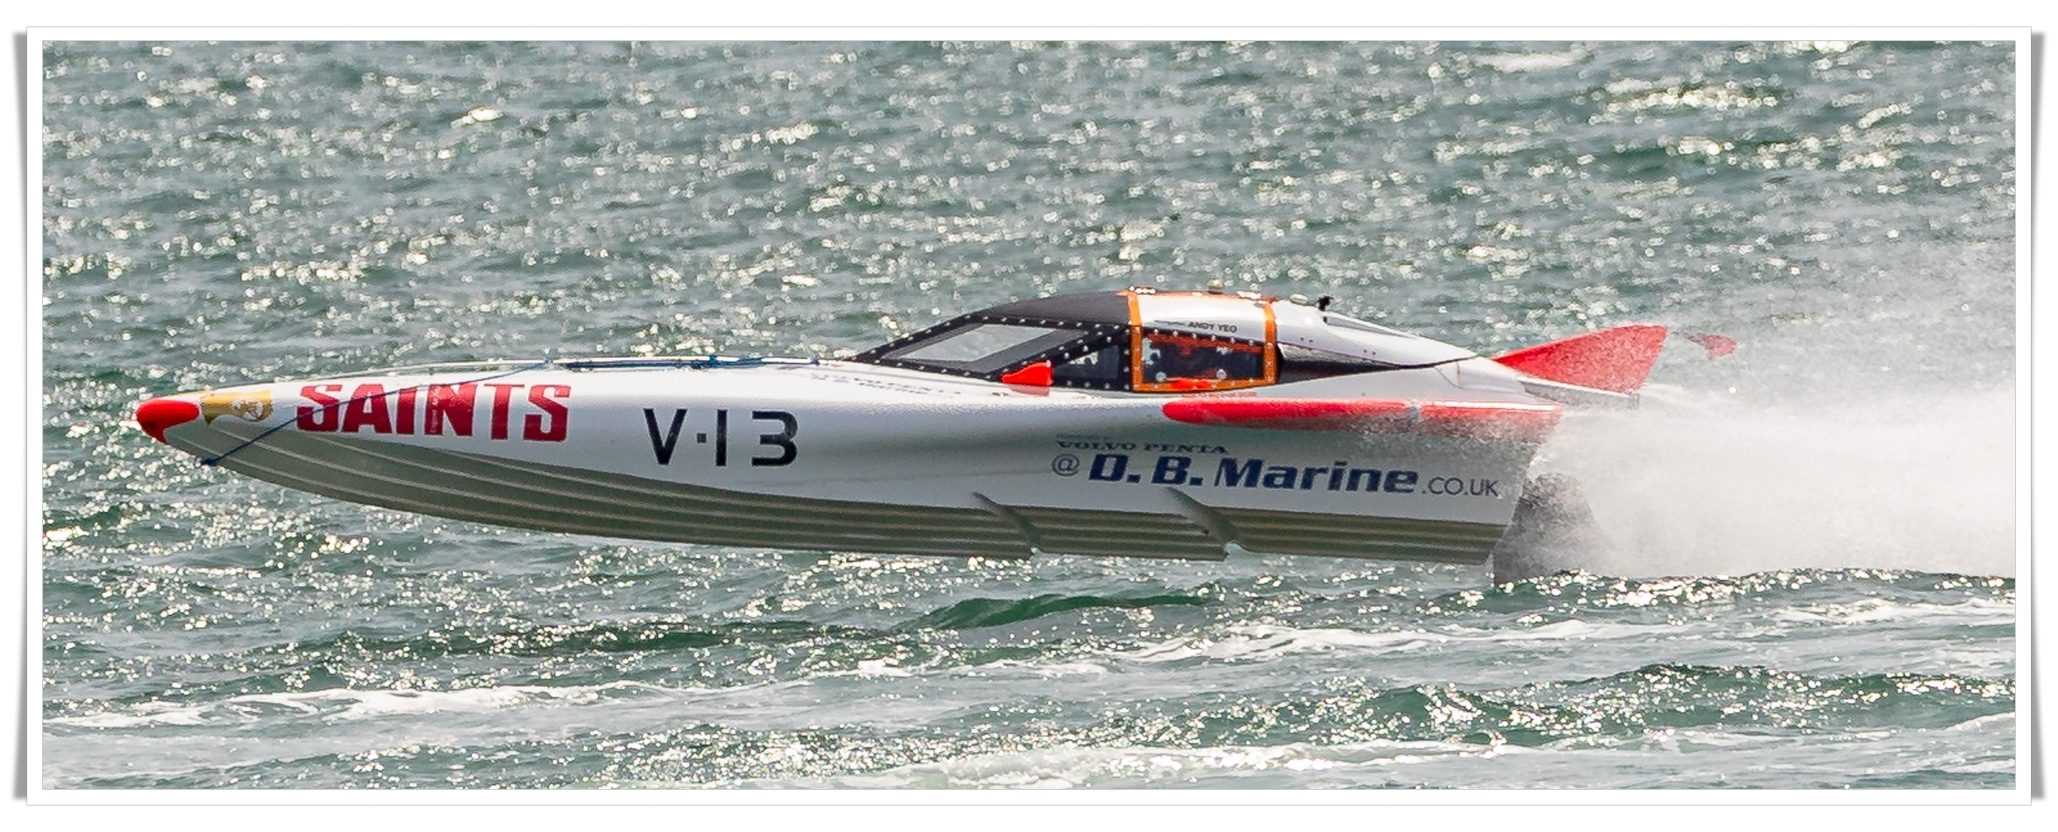 DB_Marine